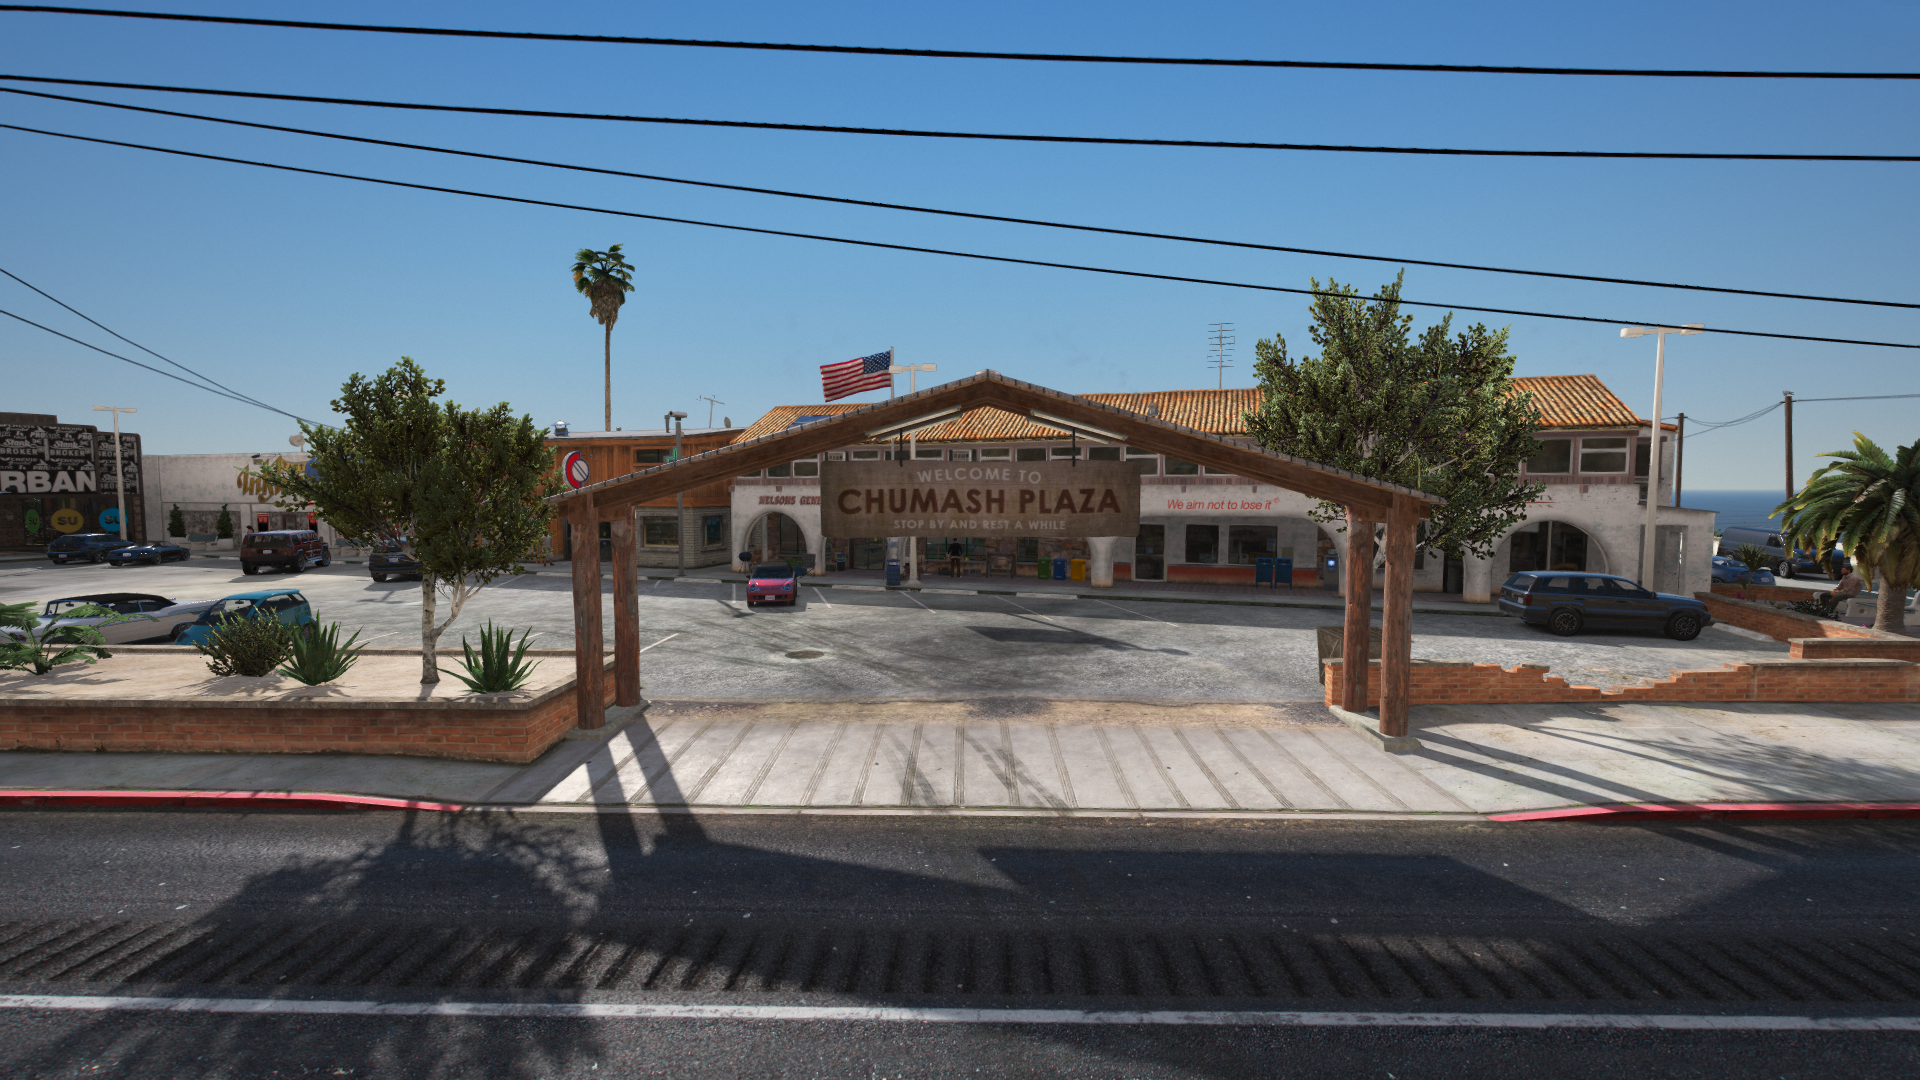 Chumash Plaza